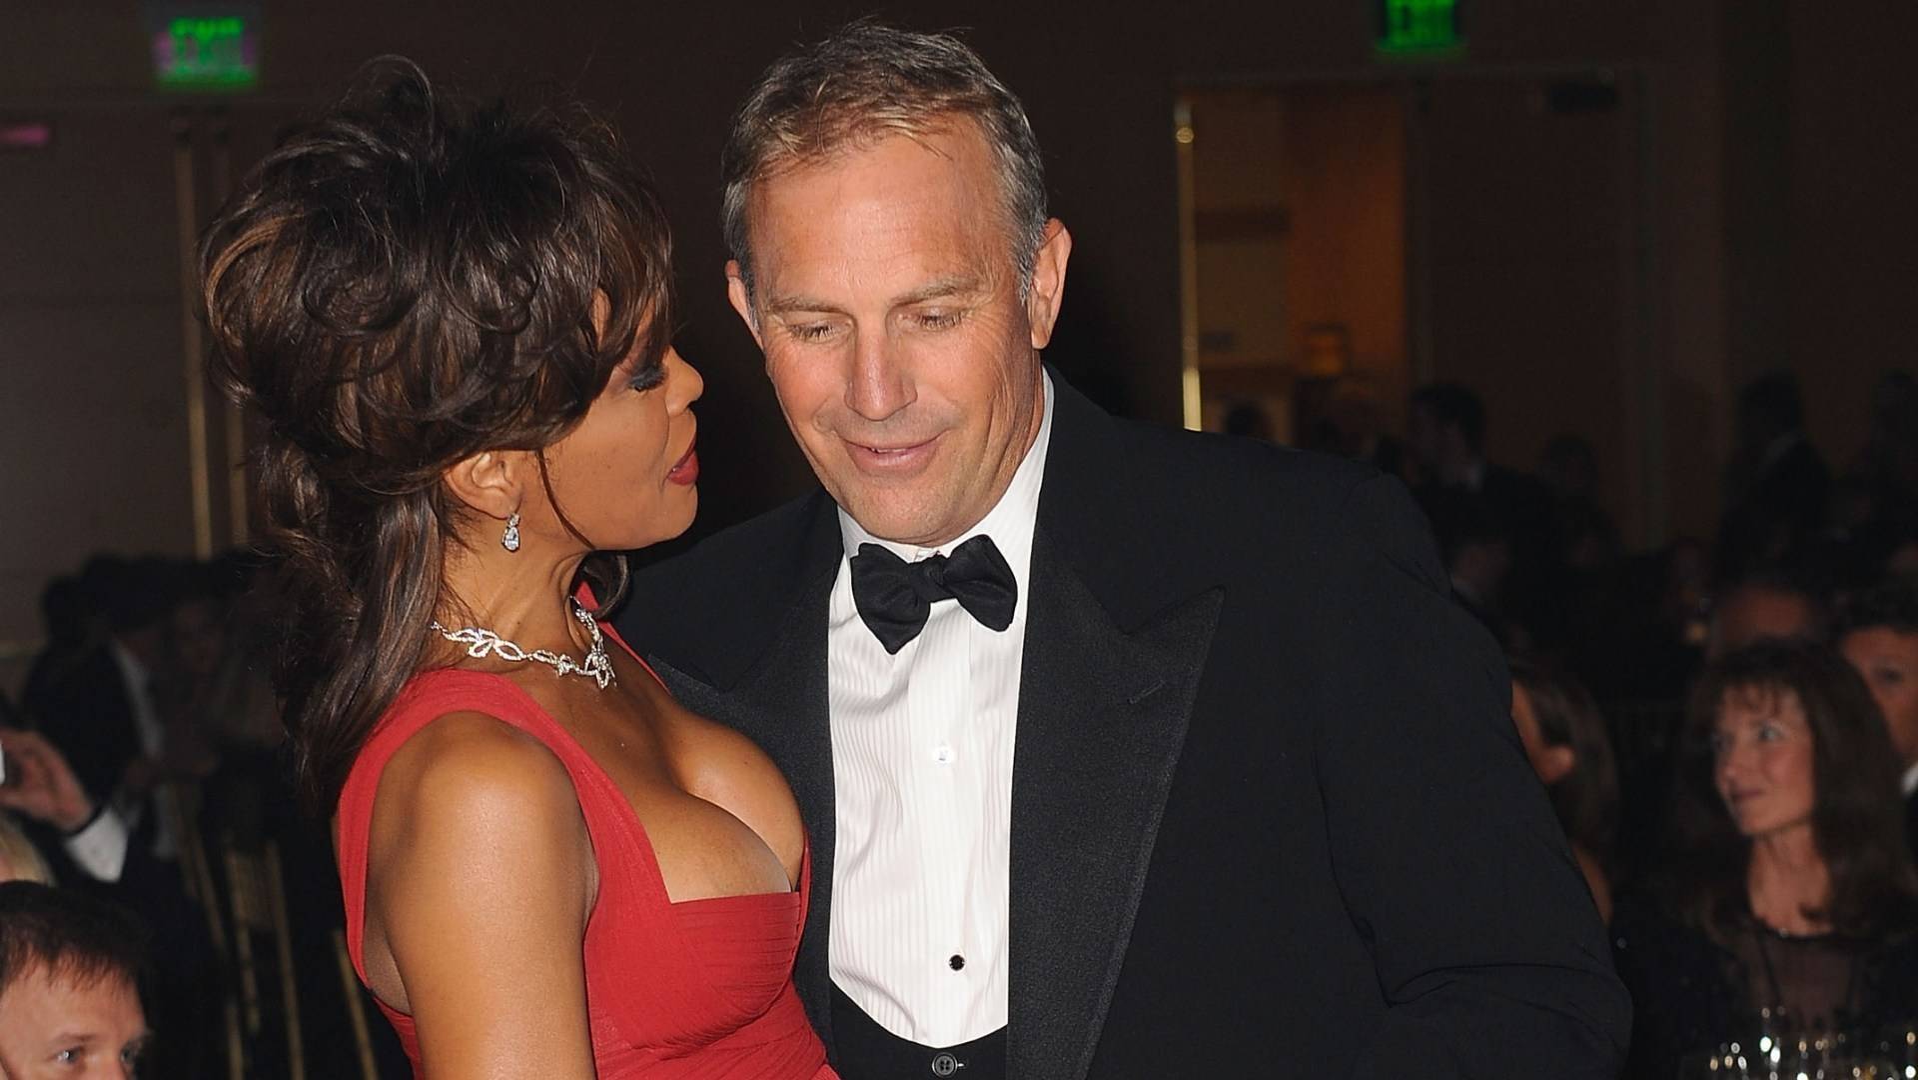 Whitney Houston e Kevin Costner (Guardia del corpo), foto: Getty Images